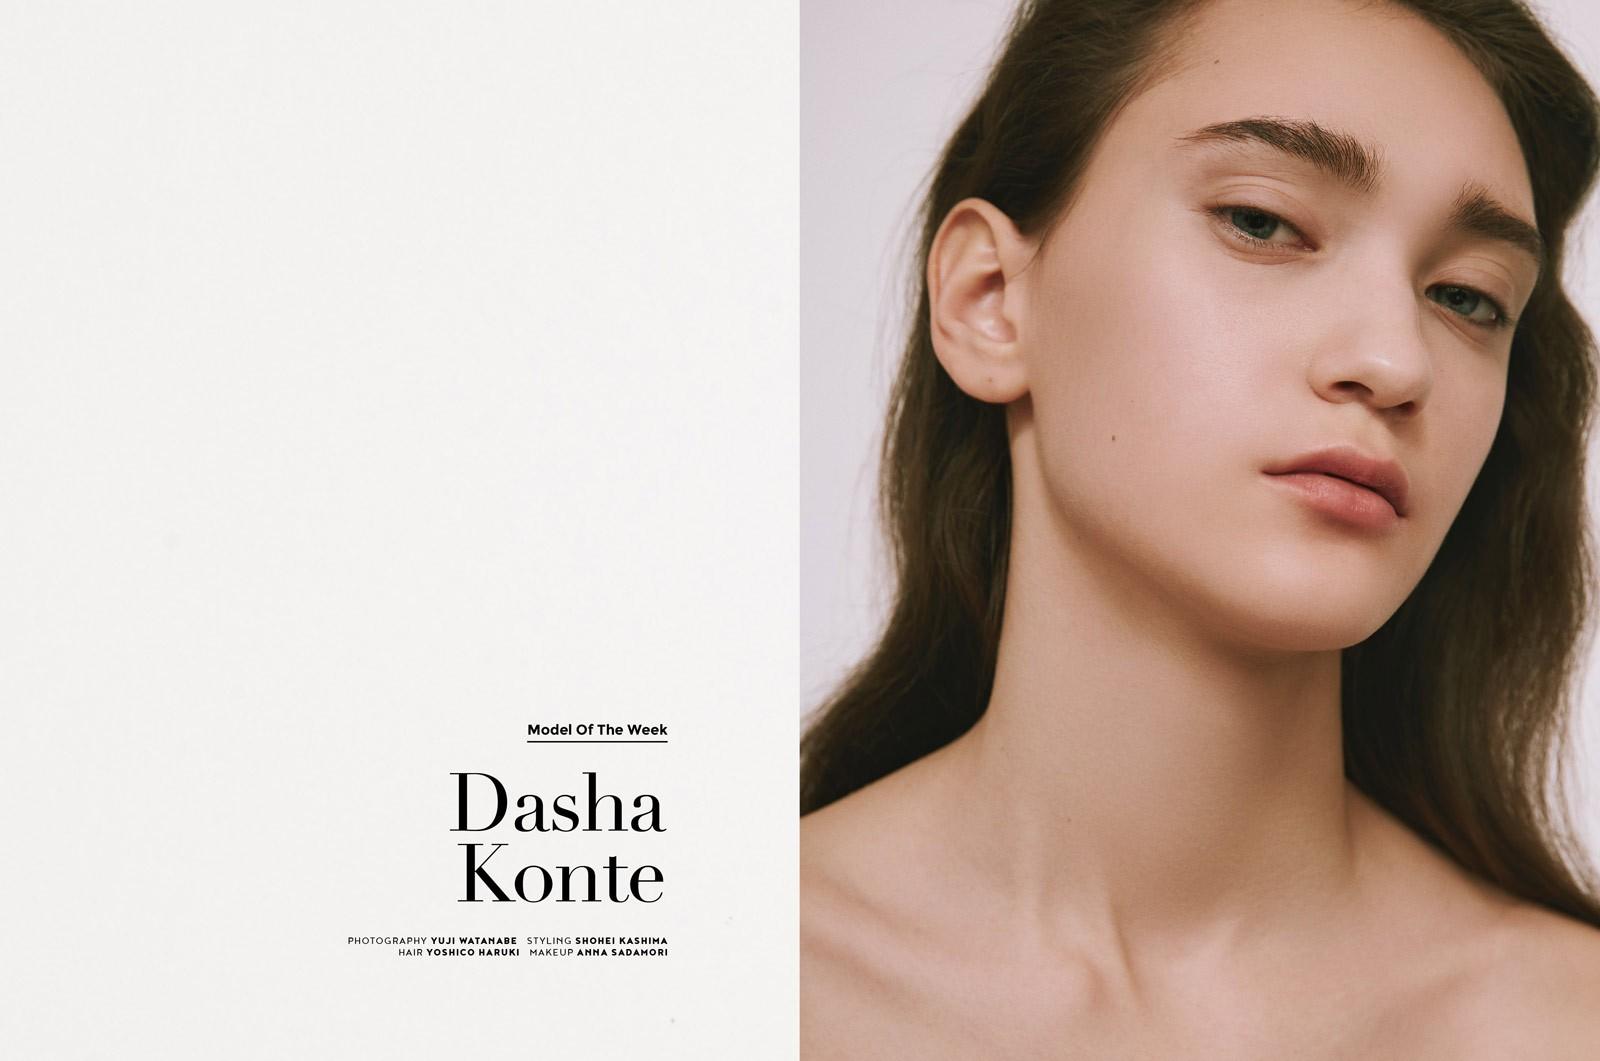 MOTW_DashaKonte_NewMadison_web-1600_01